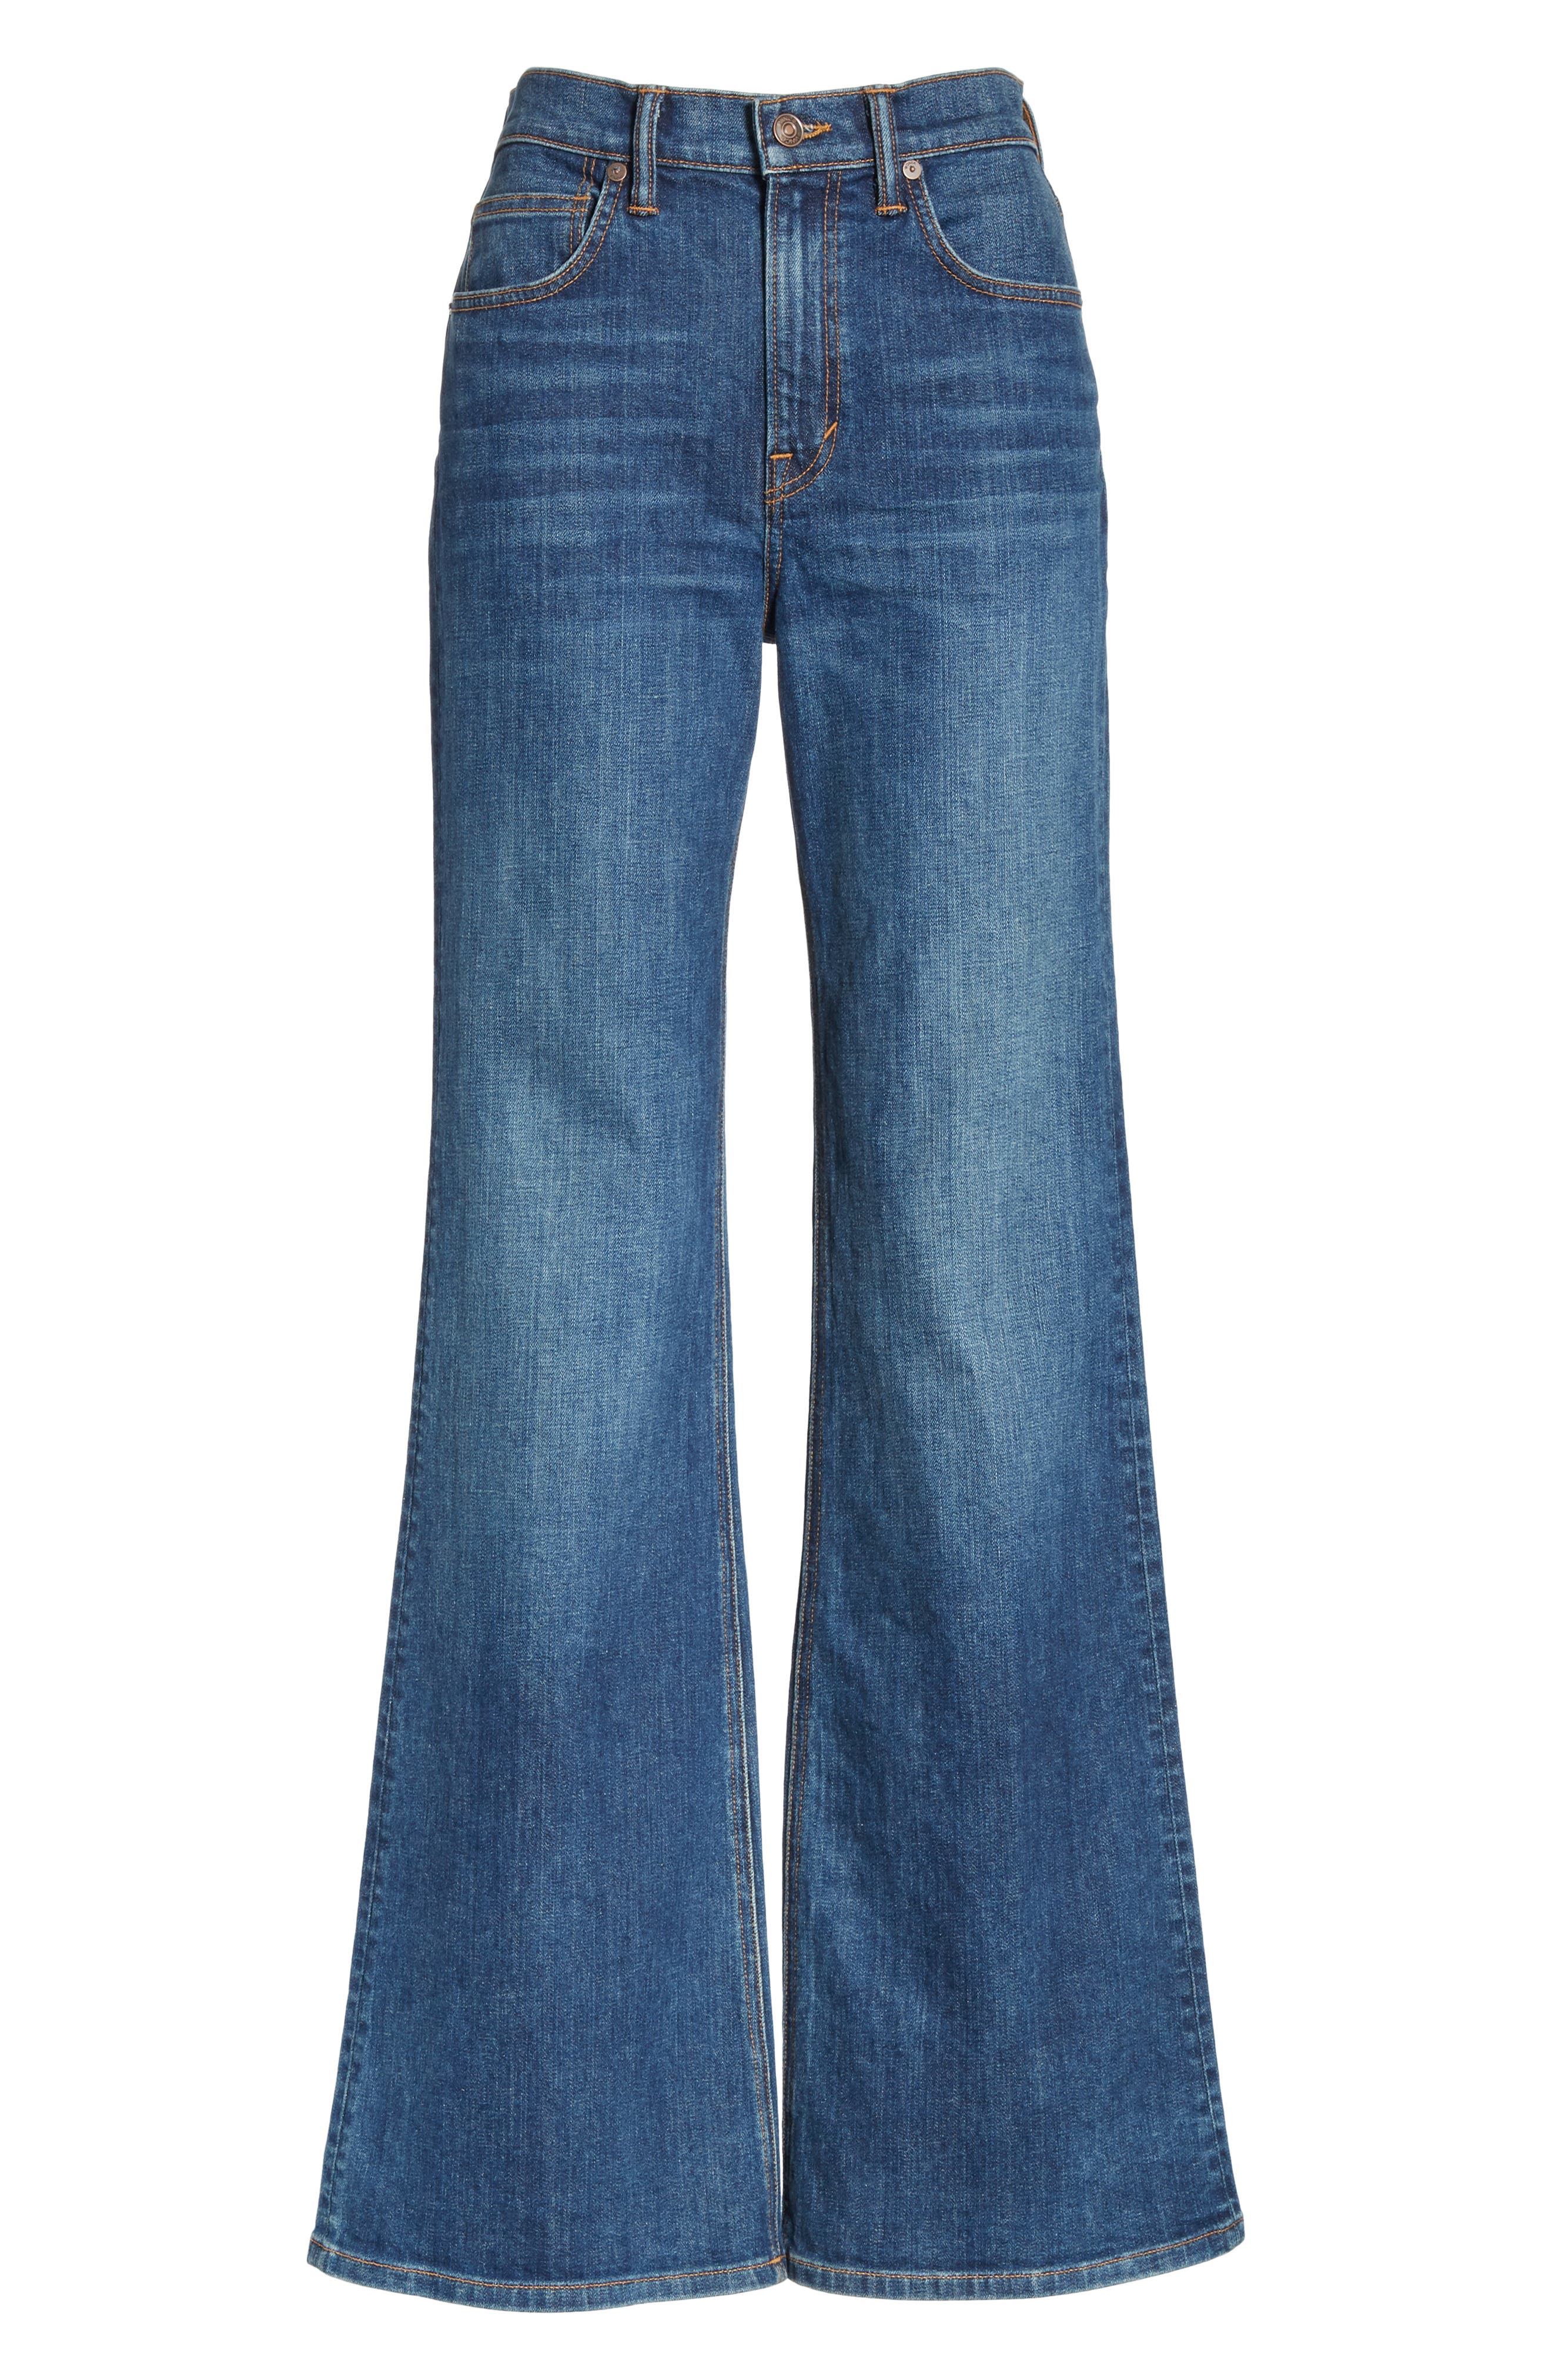 Wide Flare Leg Jeans,                             Alternate thumbnail 6, color,                             TRUE VINTAGE WASH